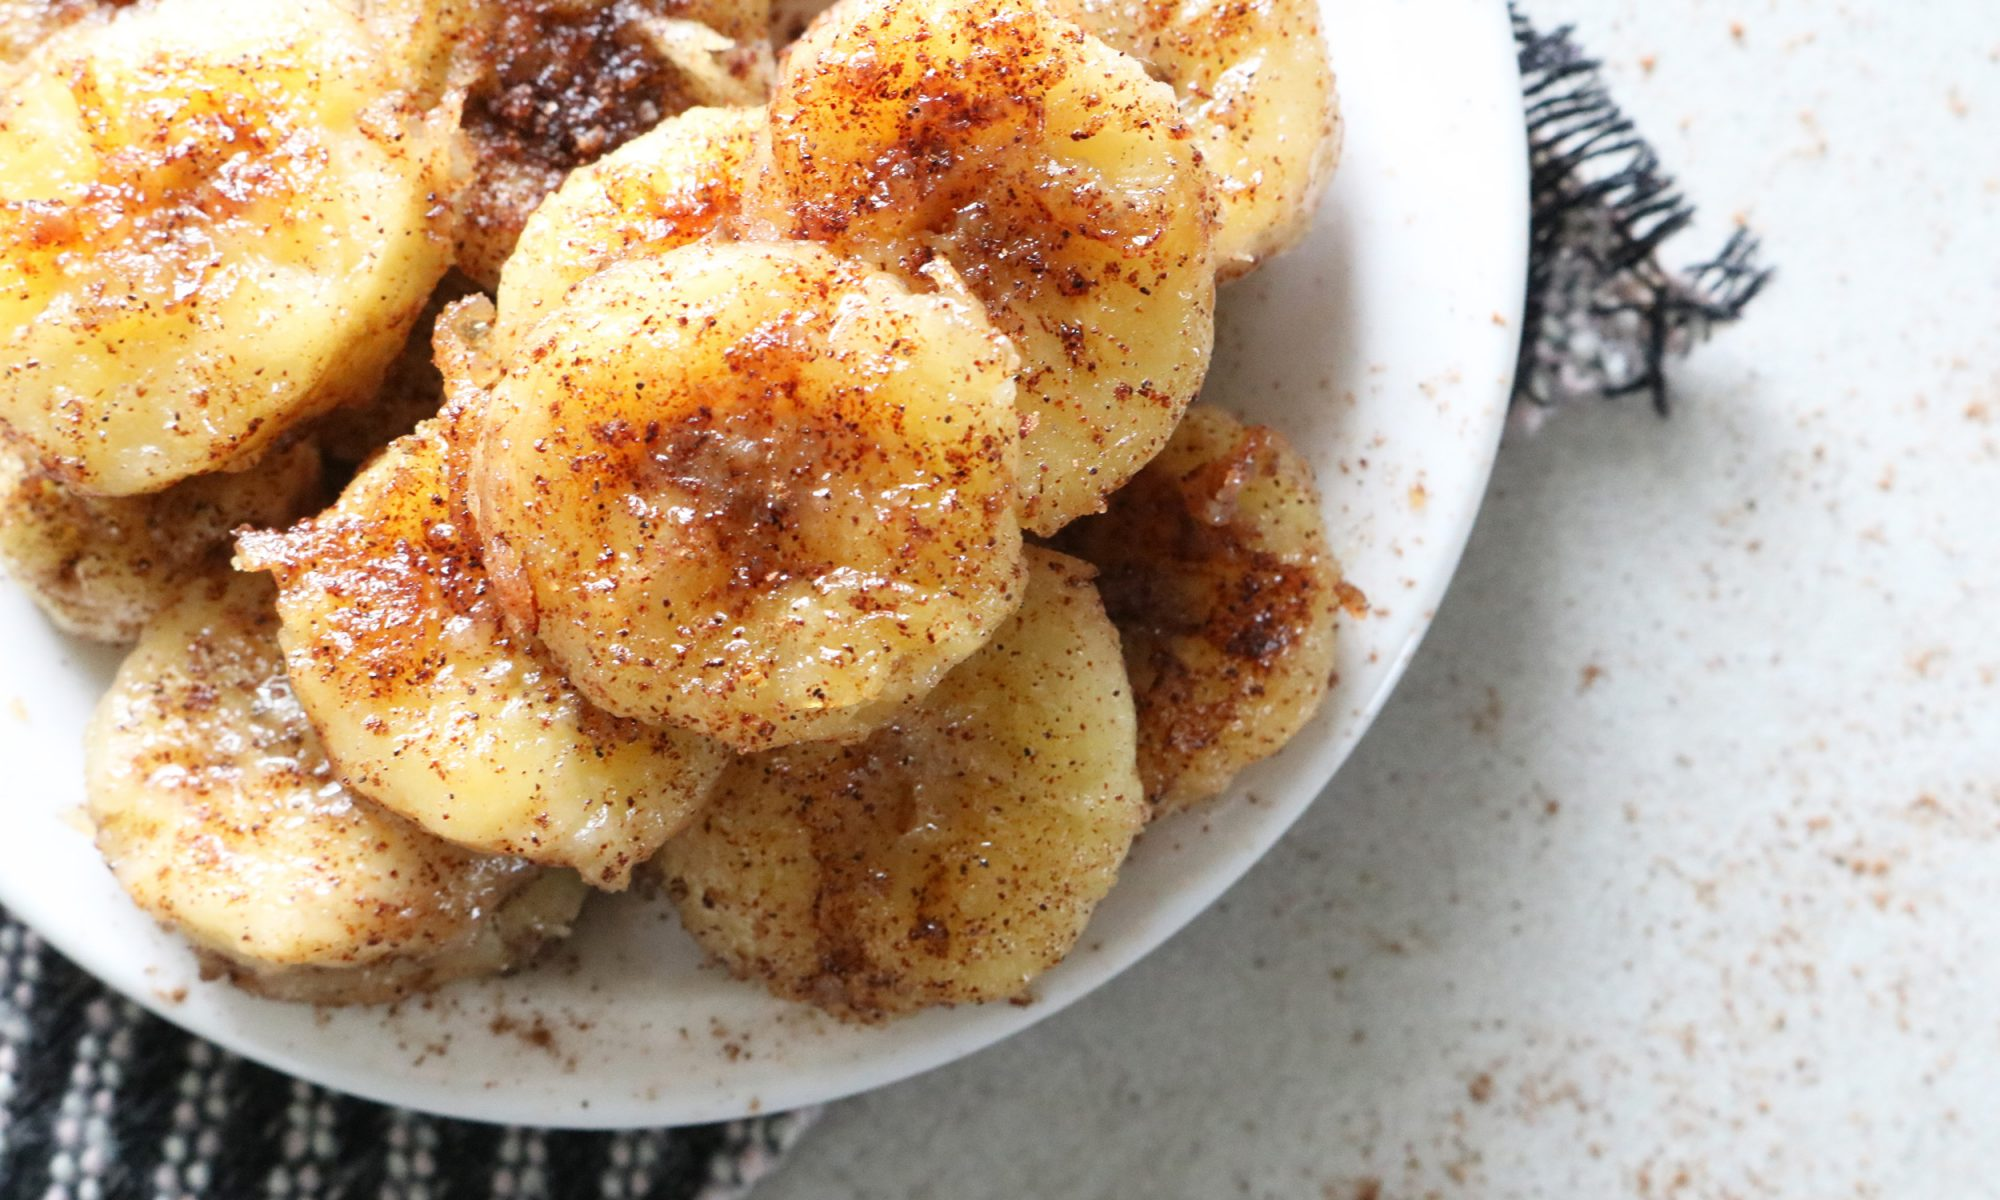 EC: Pan-Fried Cinnamon Bananas Are Ridiculously Easy